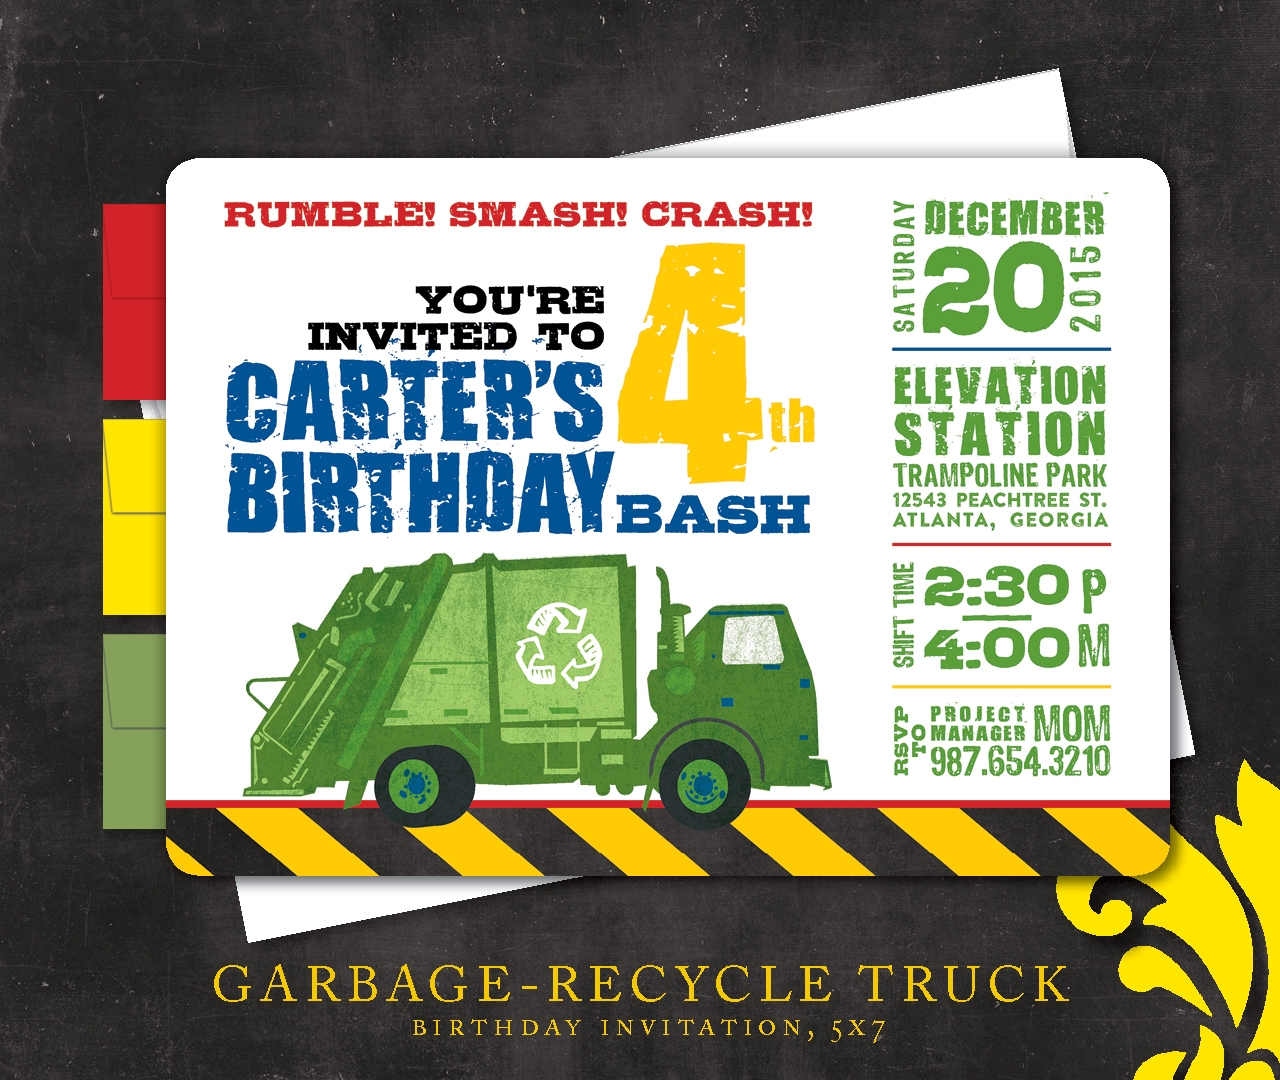 Nealon design garbagerecycle truck birthday invitation garbagerecycle truck birthday invitation filmwisefo